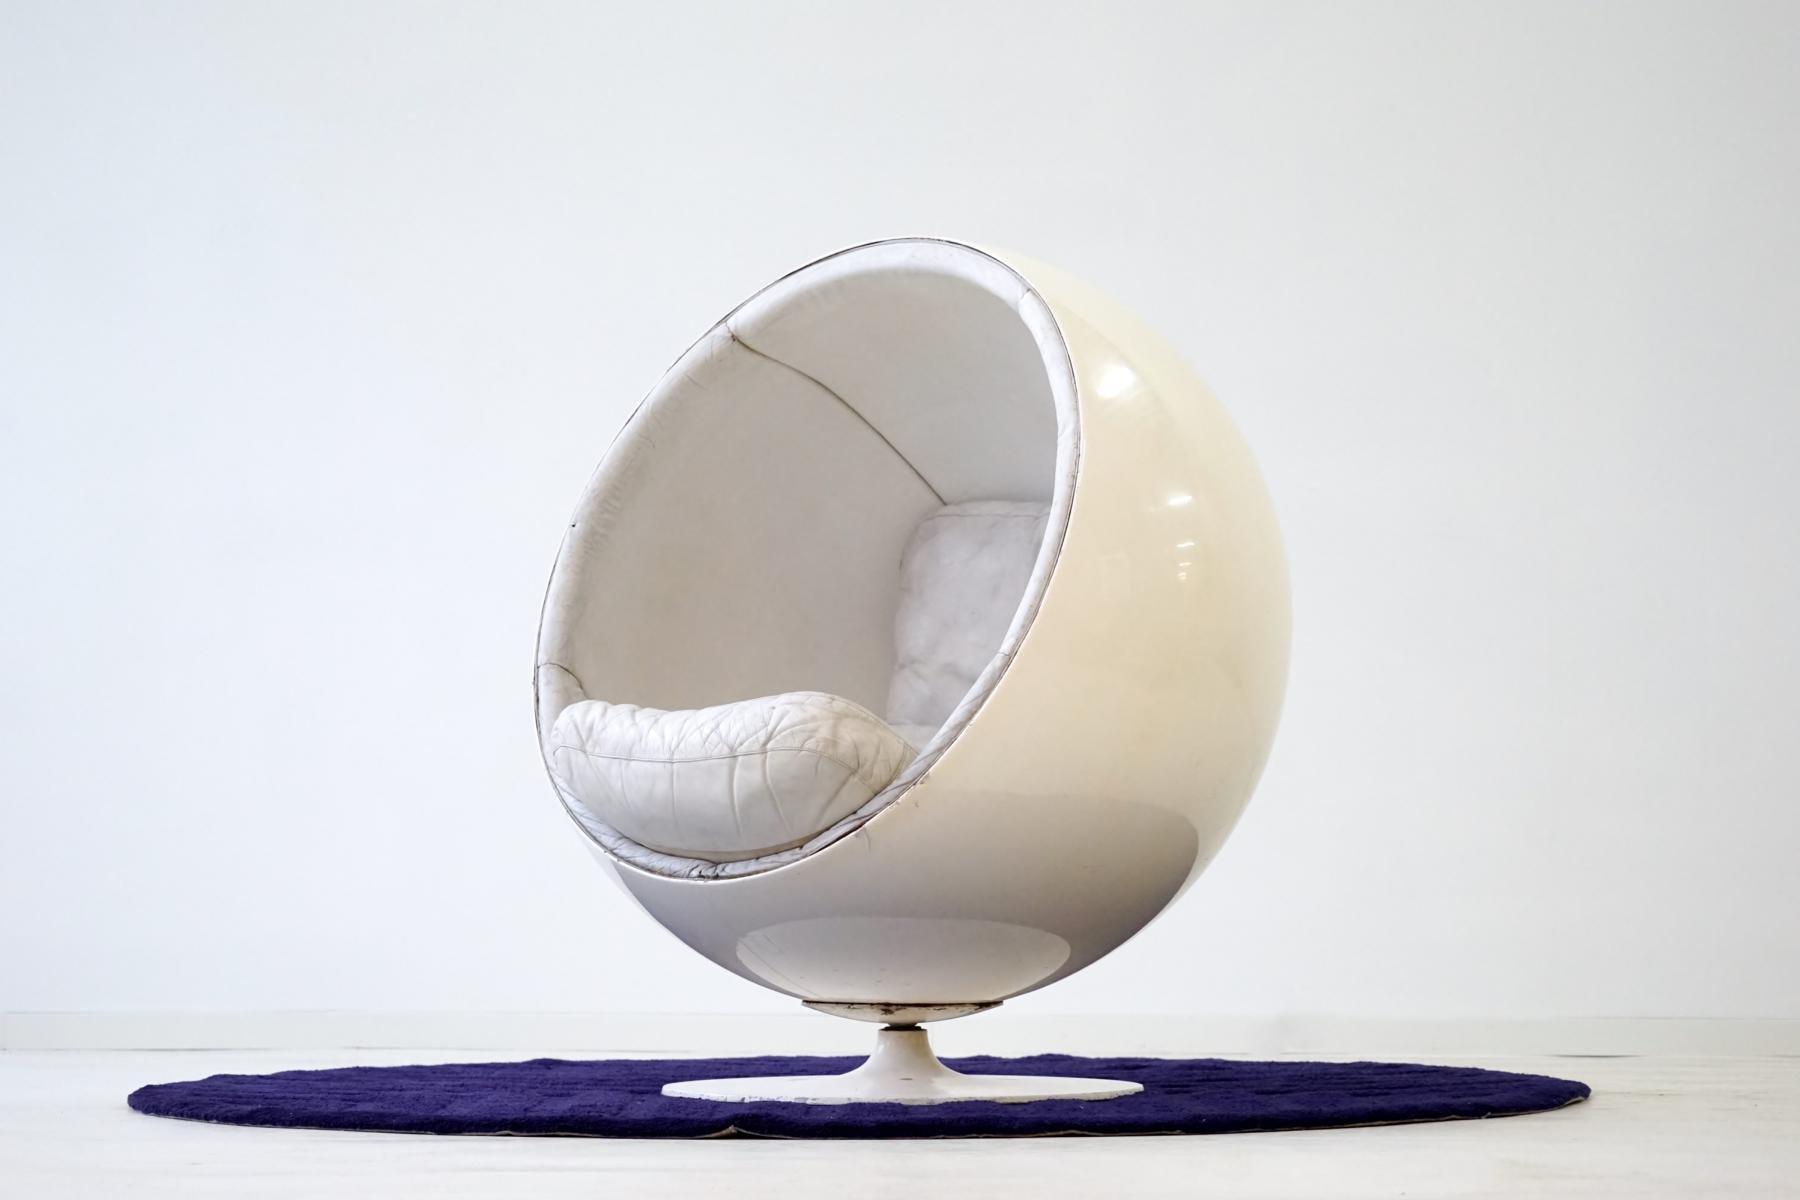 Fresh Eero Aarnio Ball Chair Scheme